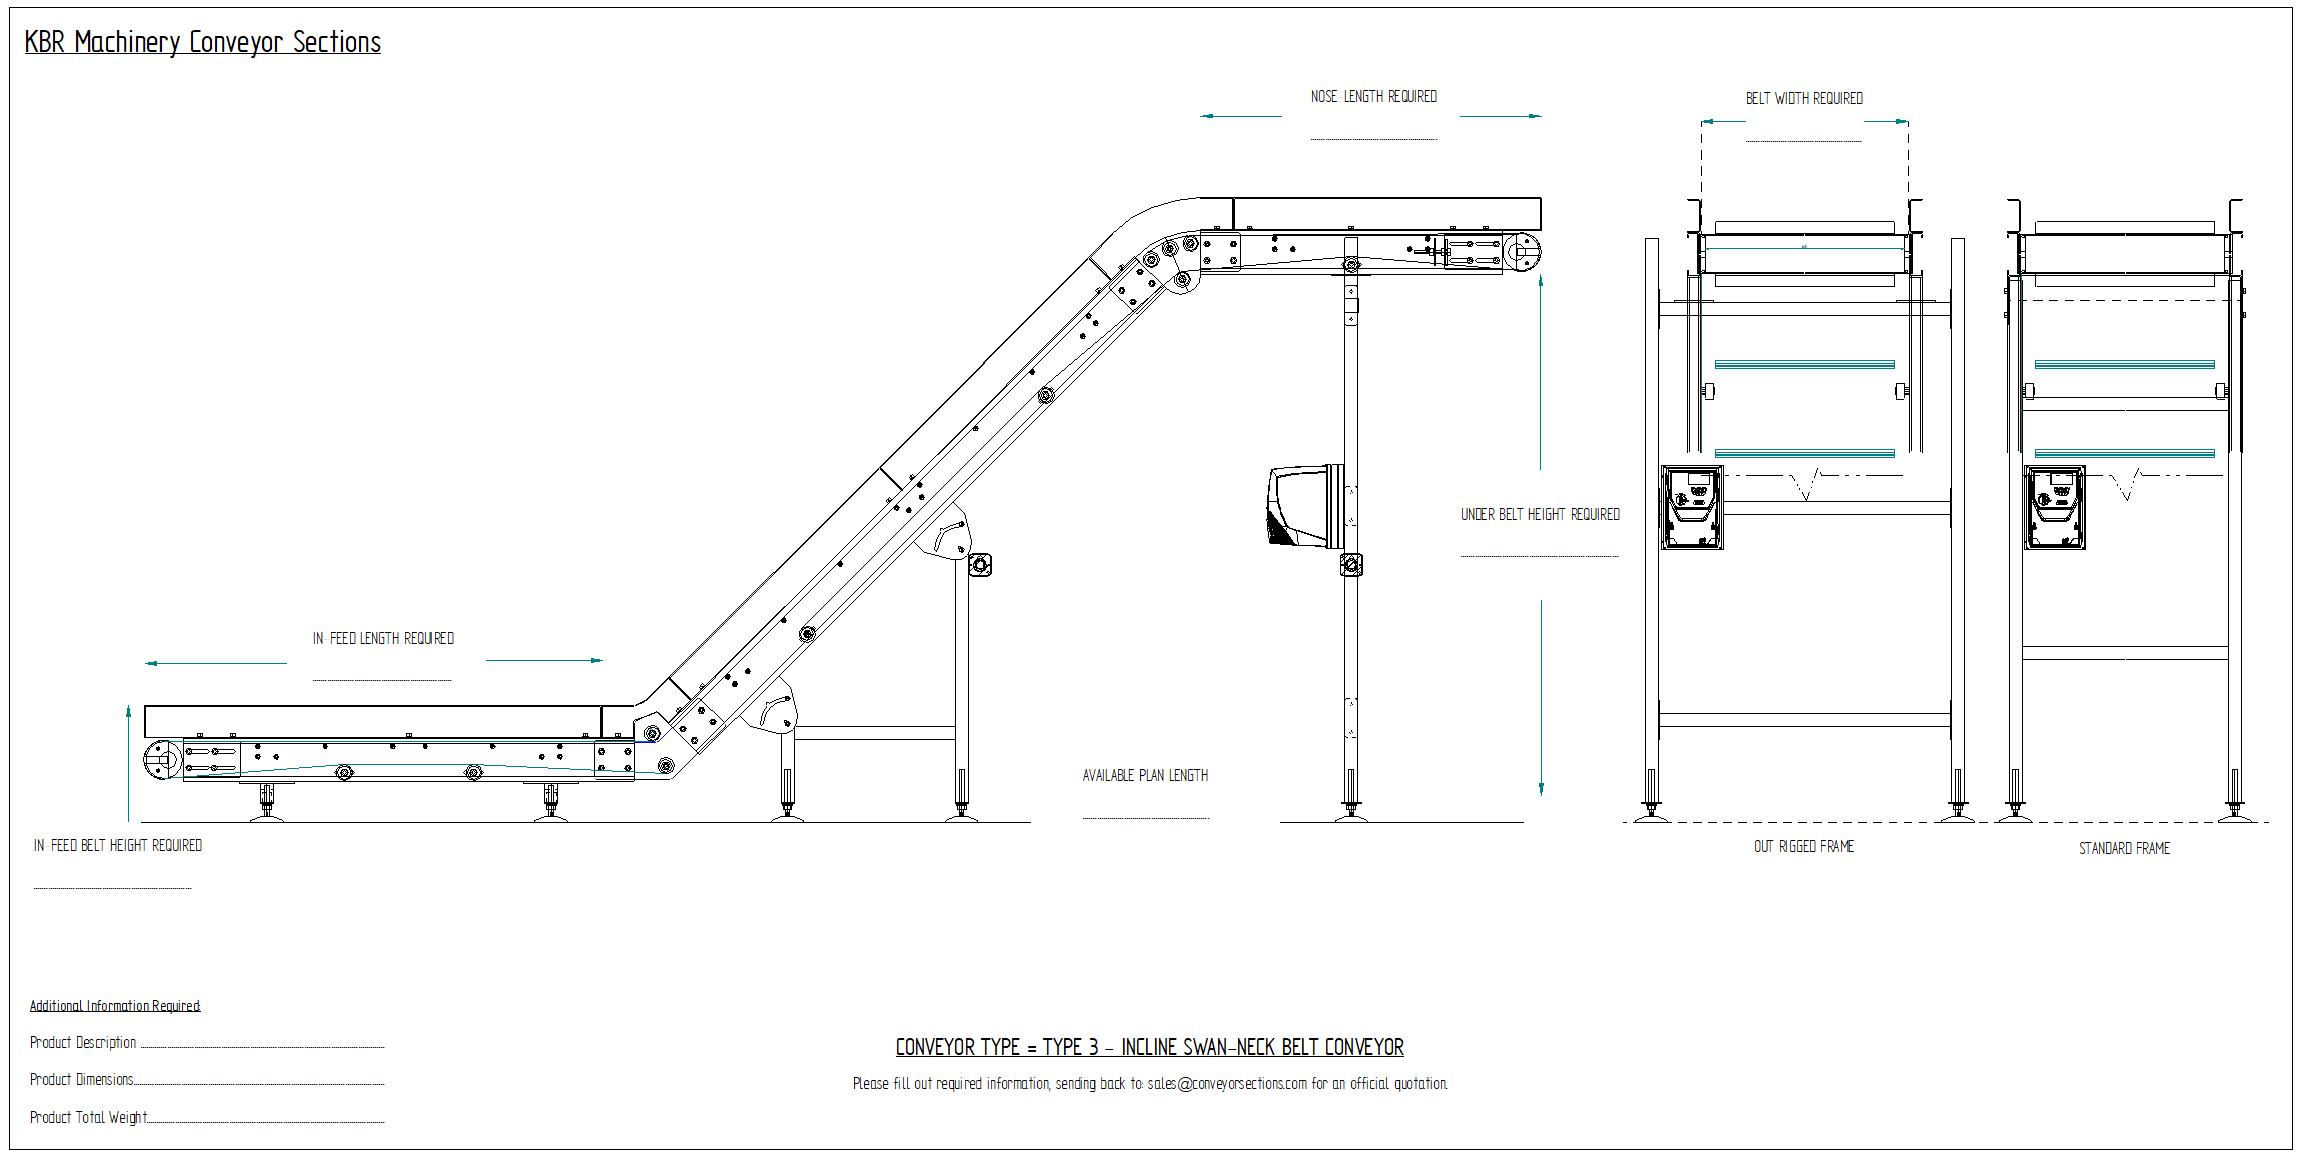 Swan neck conveyor drawing Incline Swan neck conveyor elevator Angle Conveyors Injection moulding conveyor